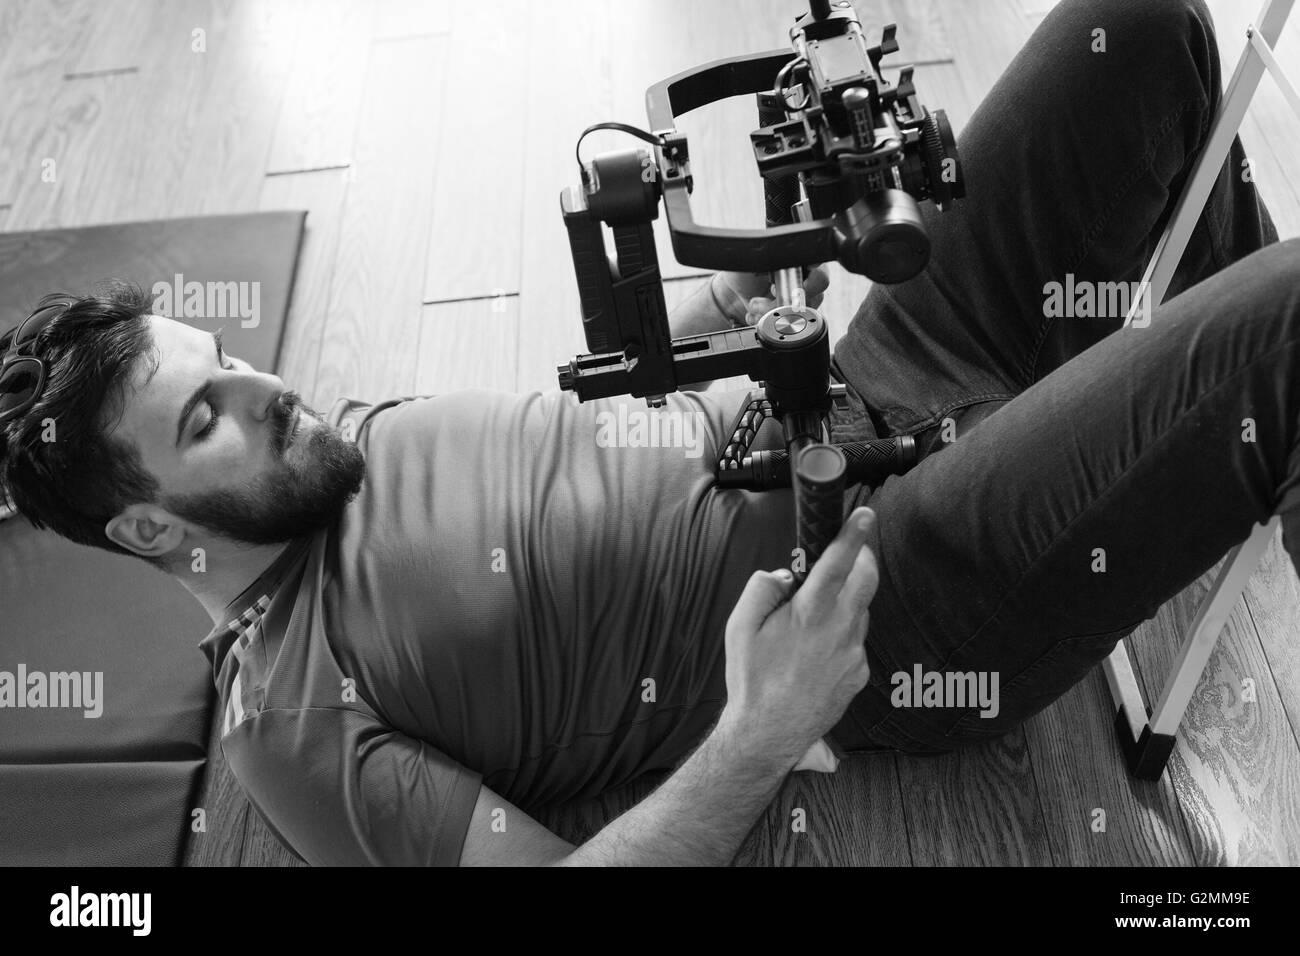 videographer with gimball video slr - Stock Image